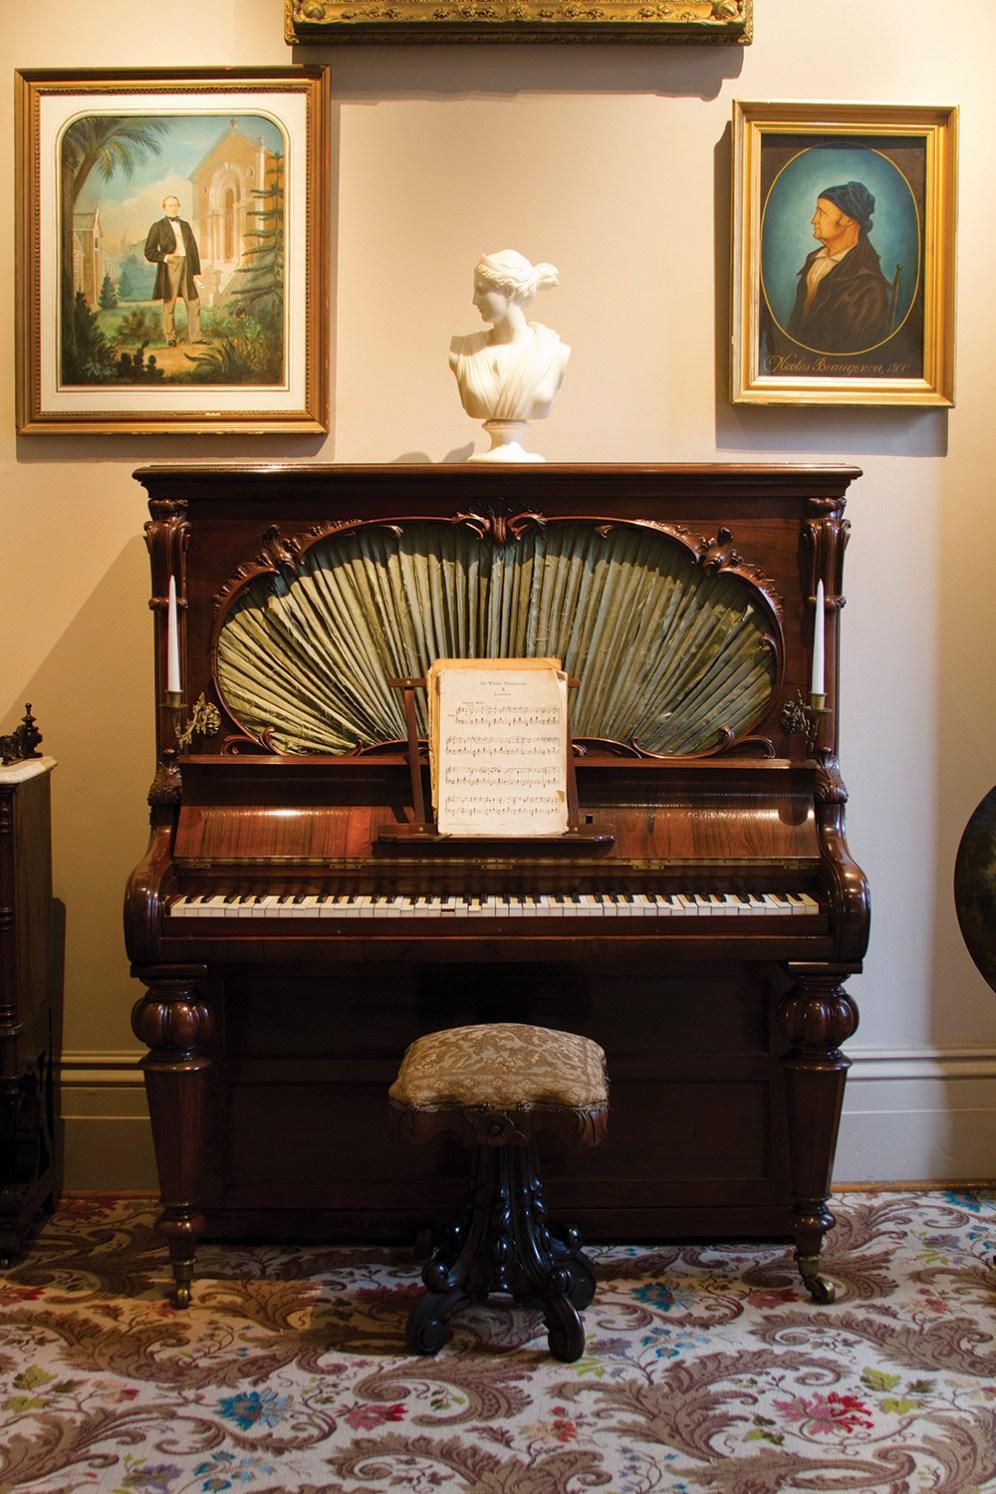 TGH_Photo-essay_12_GIBB_MG_0006_piano